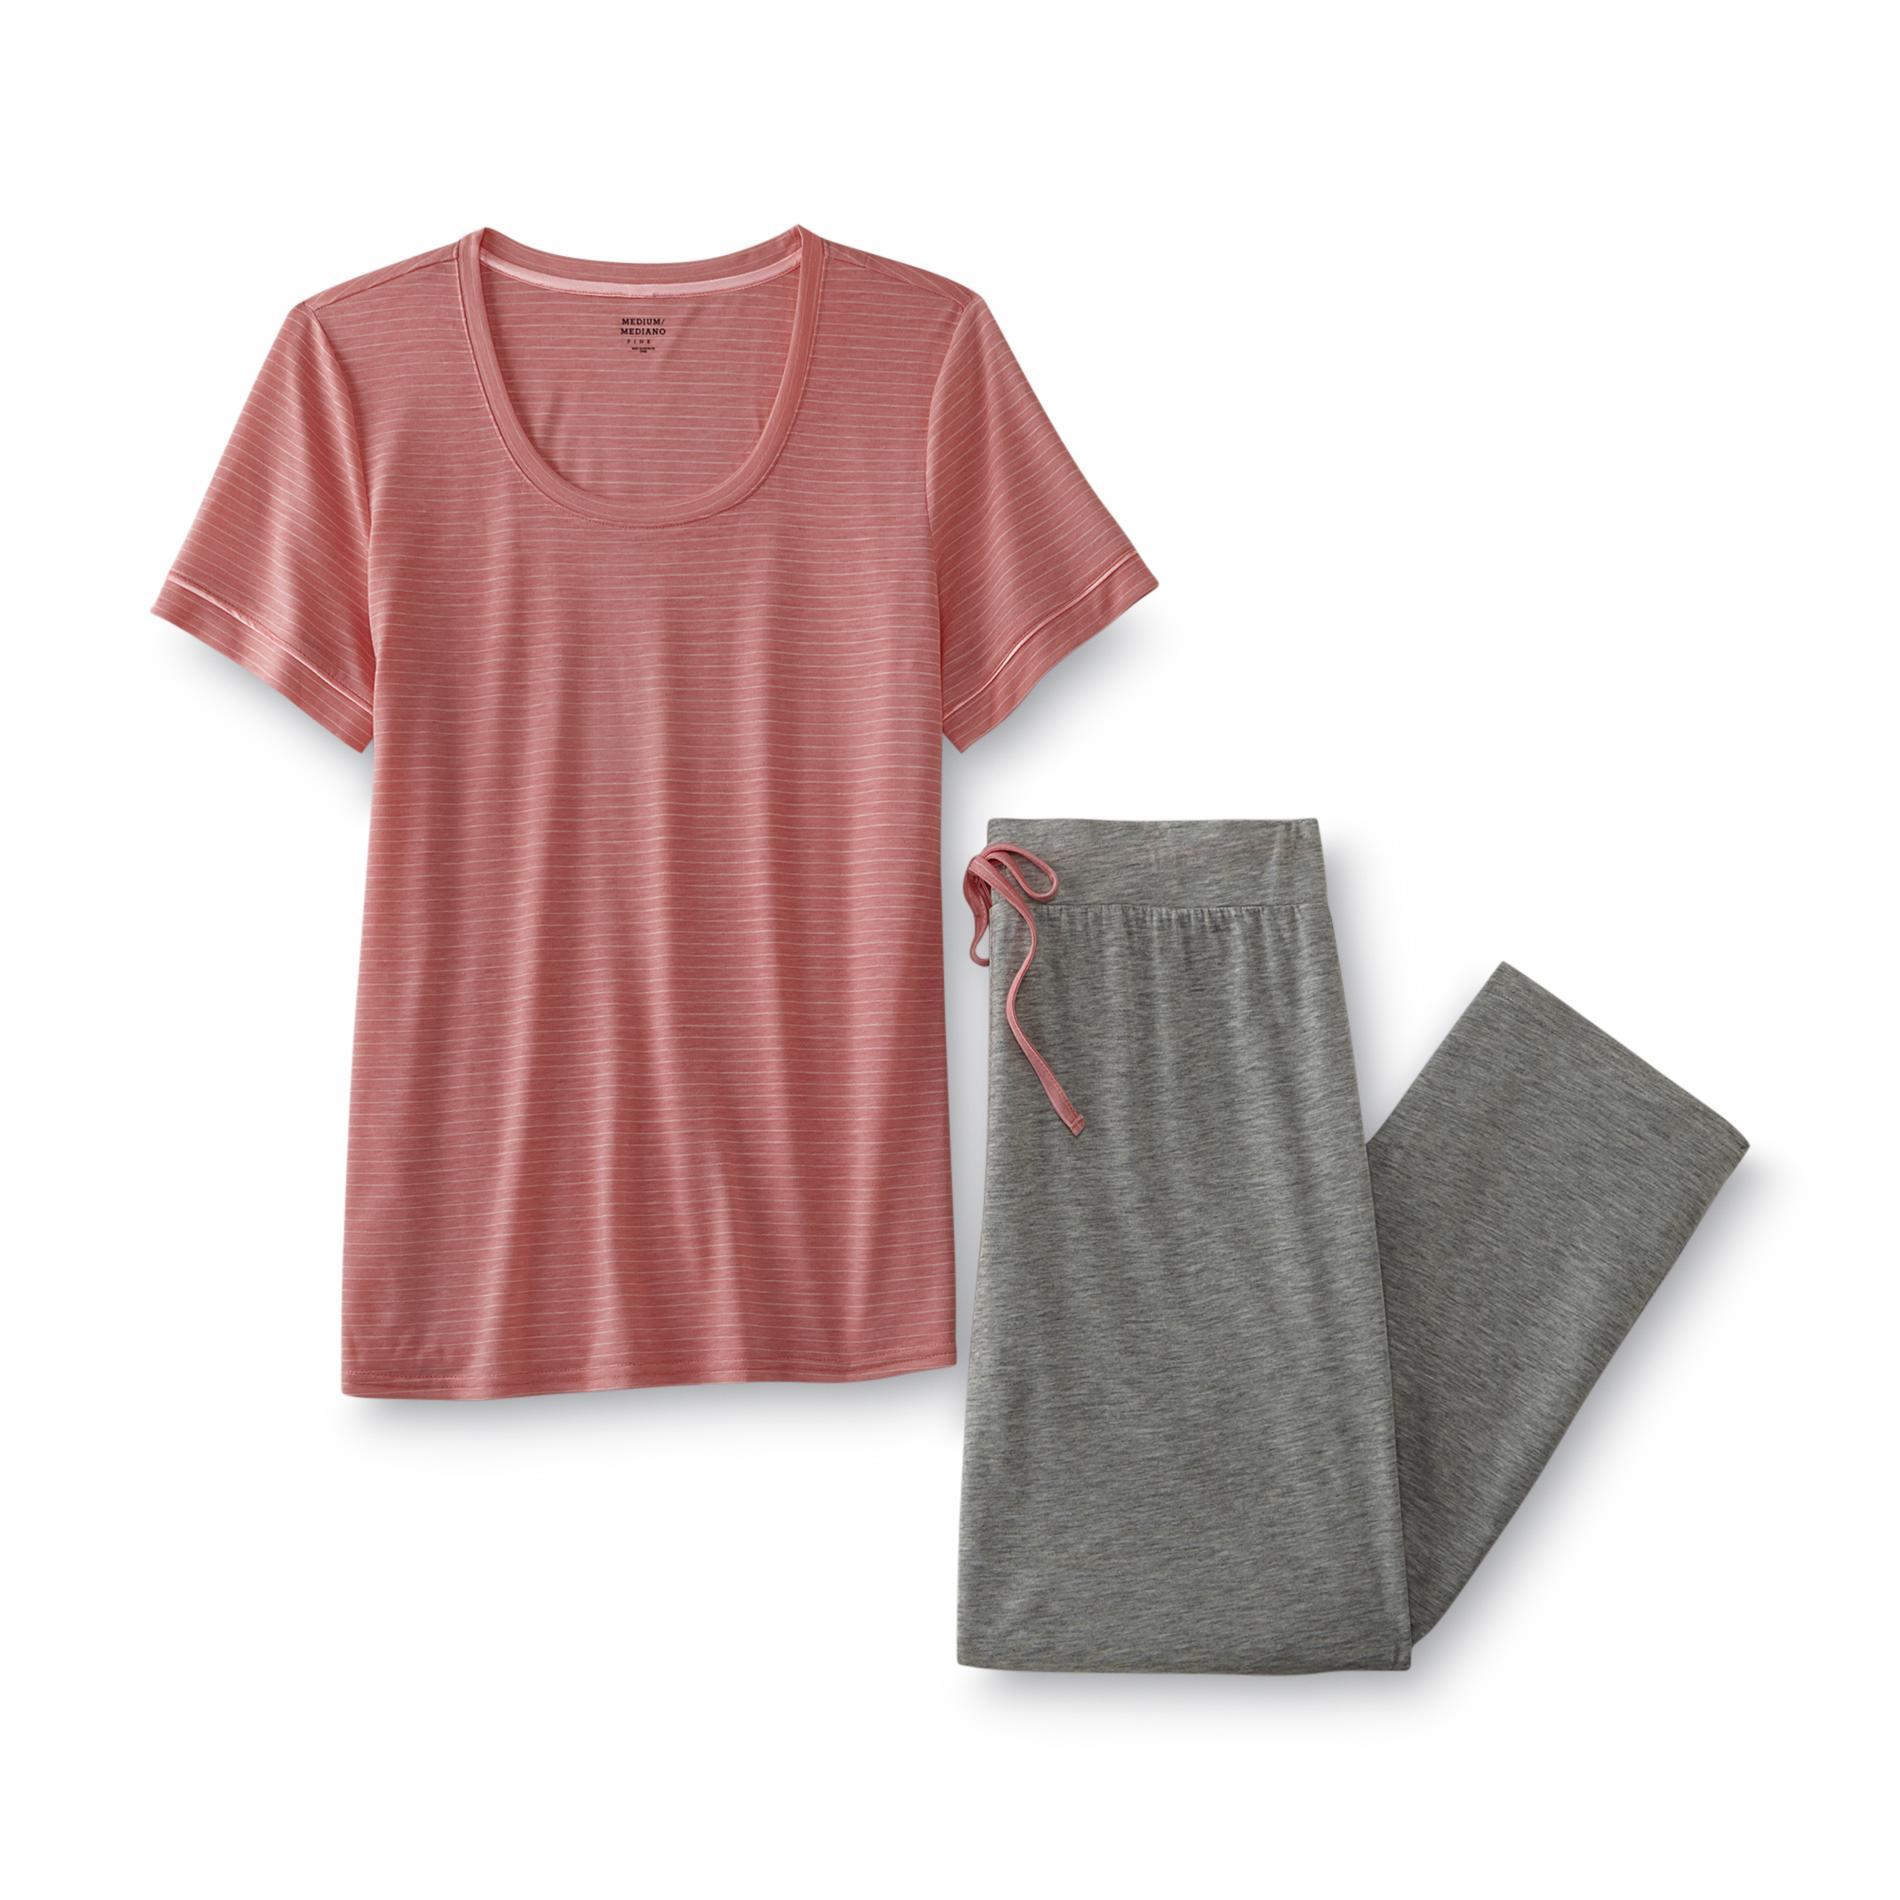 Jaclyn Smith Women' Pajama Top & Pants - Striped